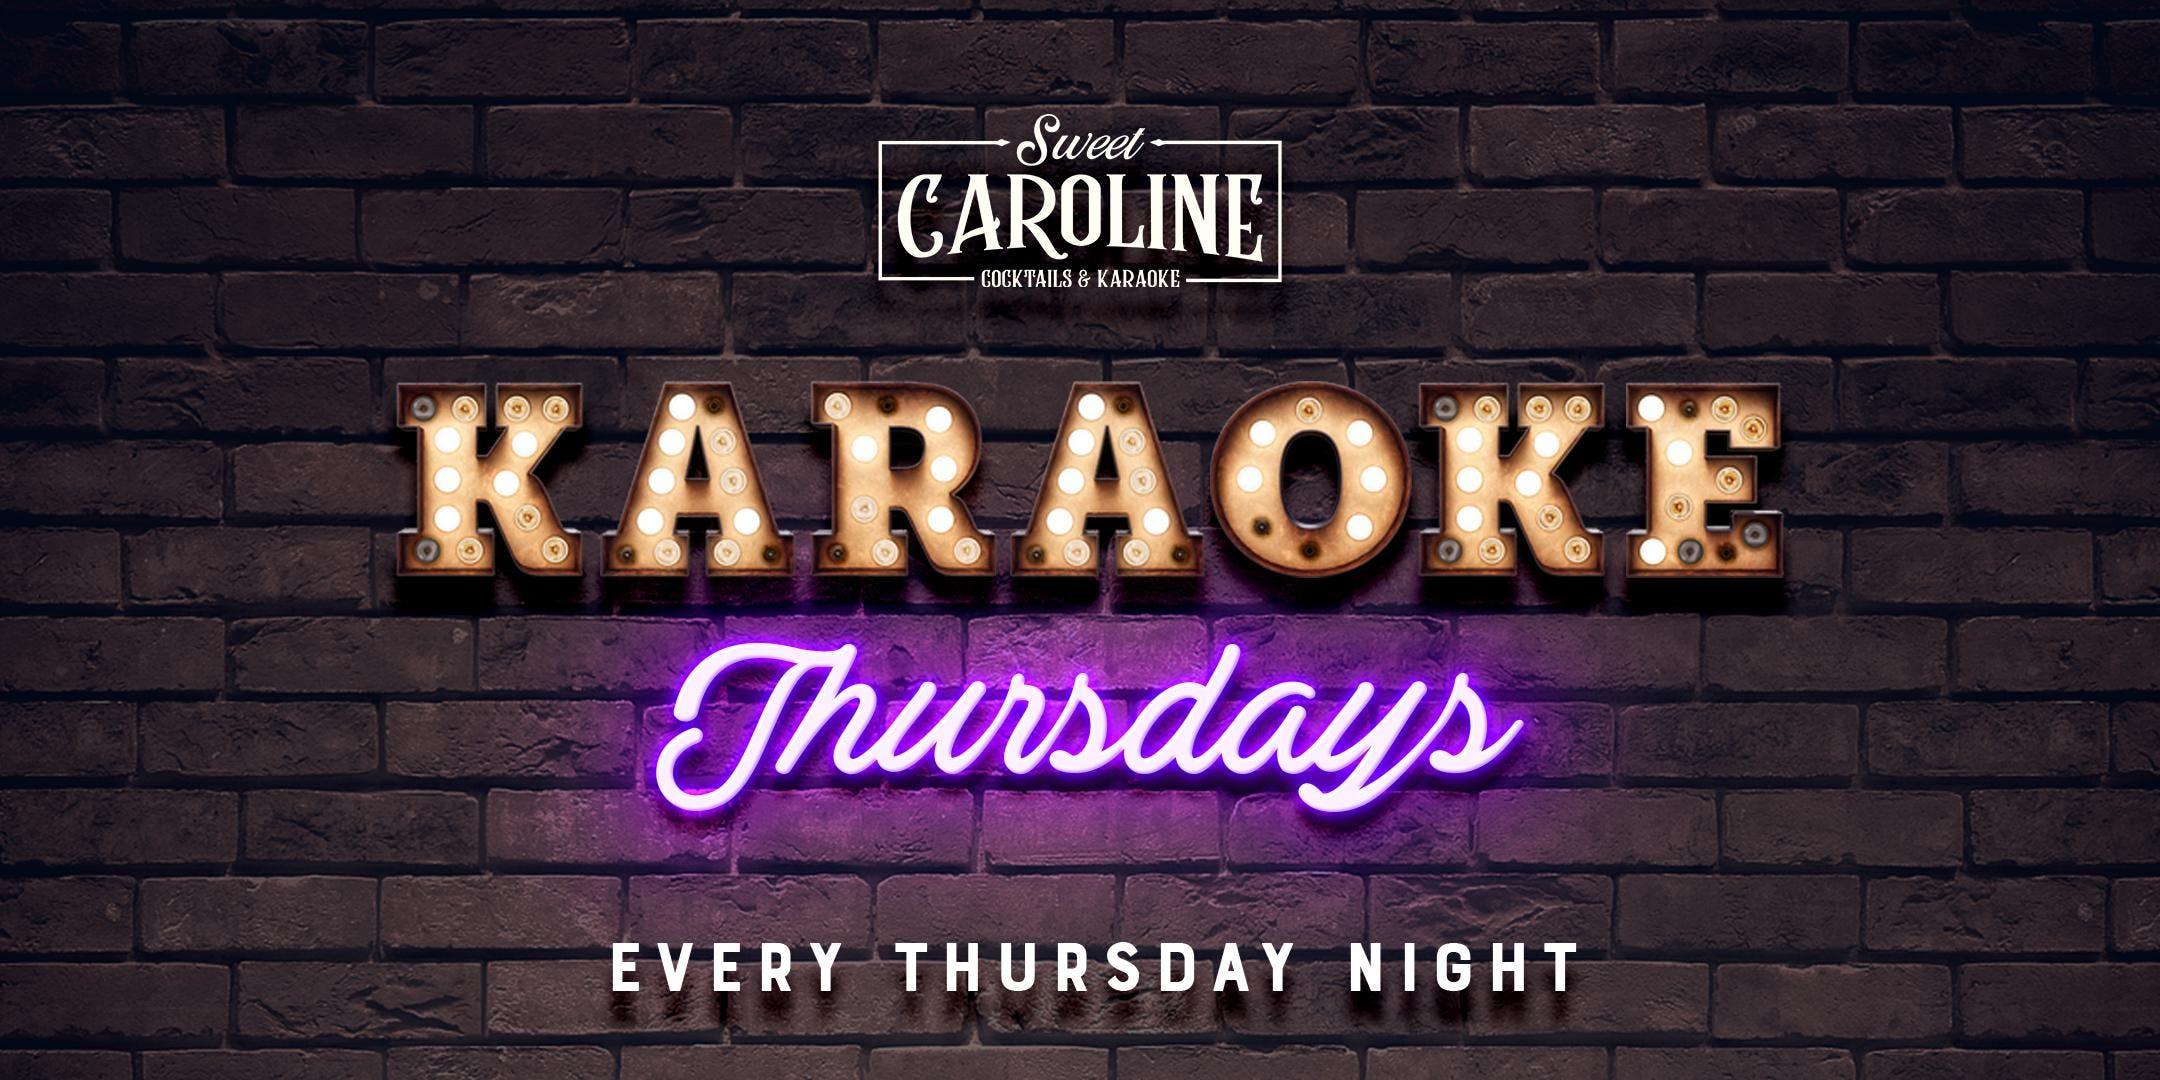 Karaoke Thursdays at Sweet Caroline - Free Dr